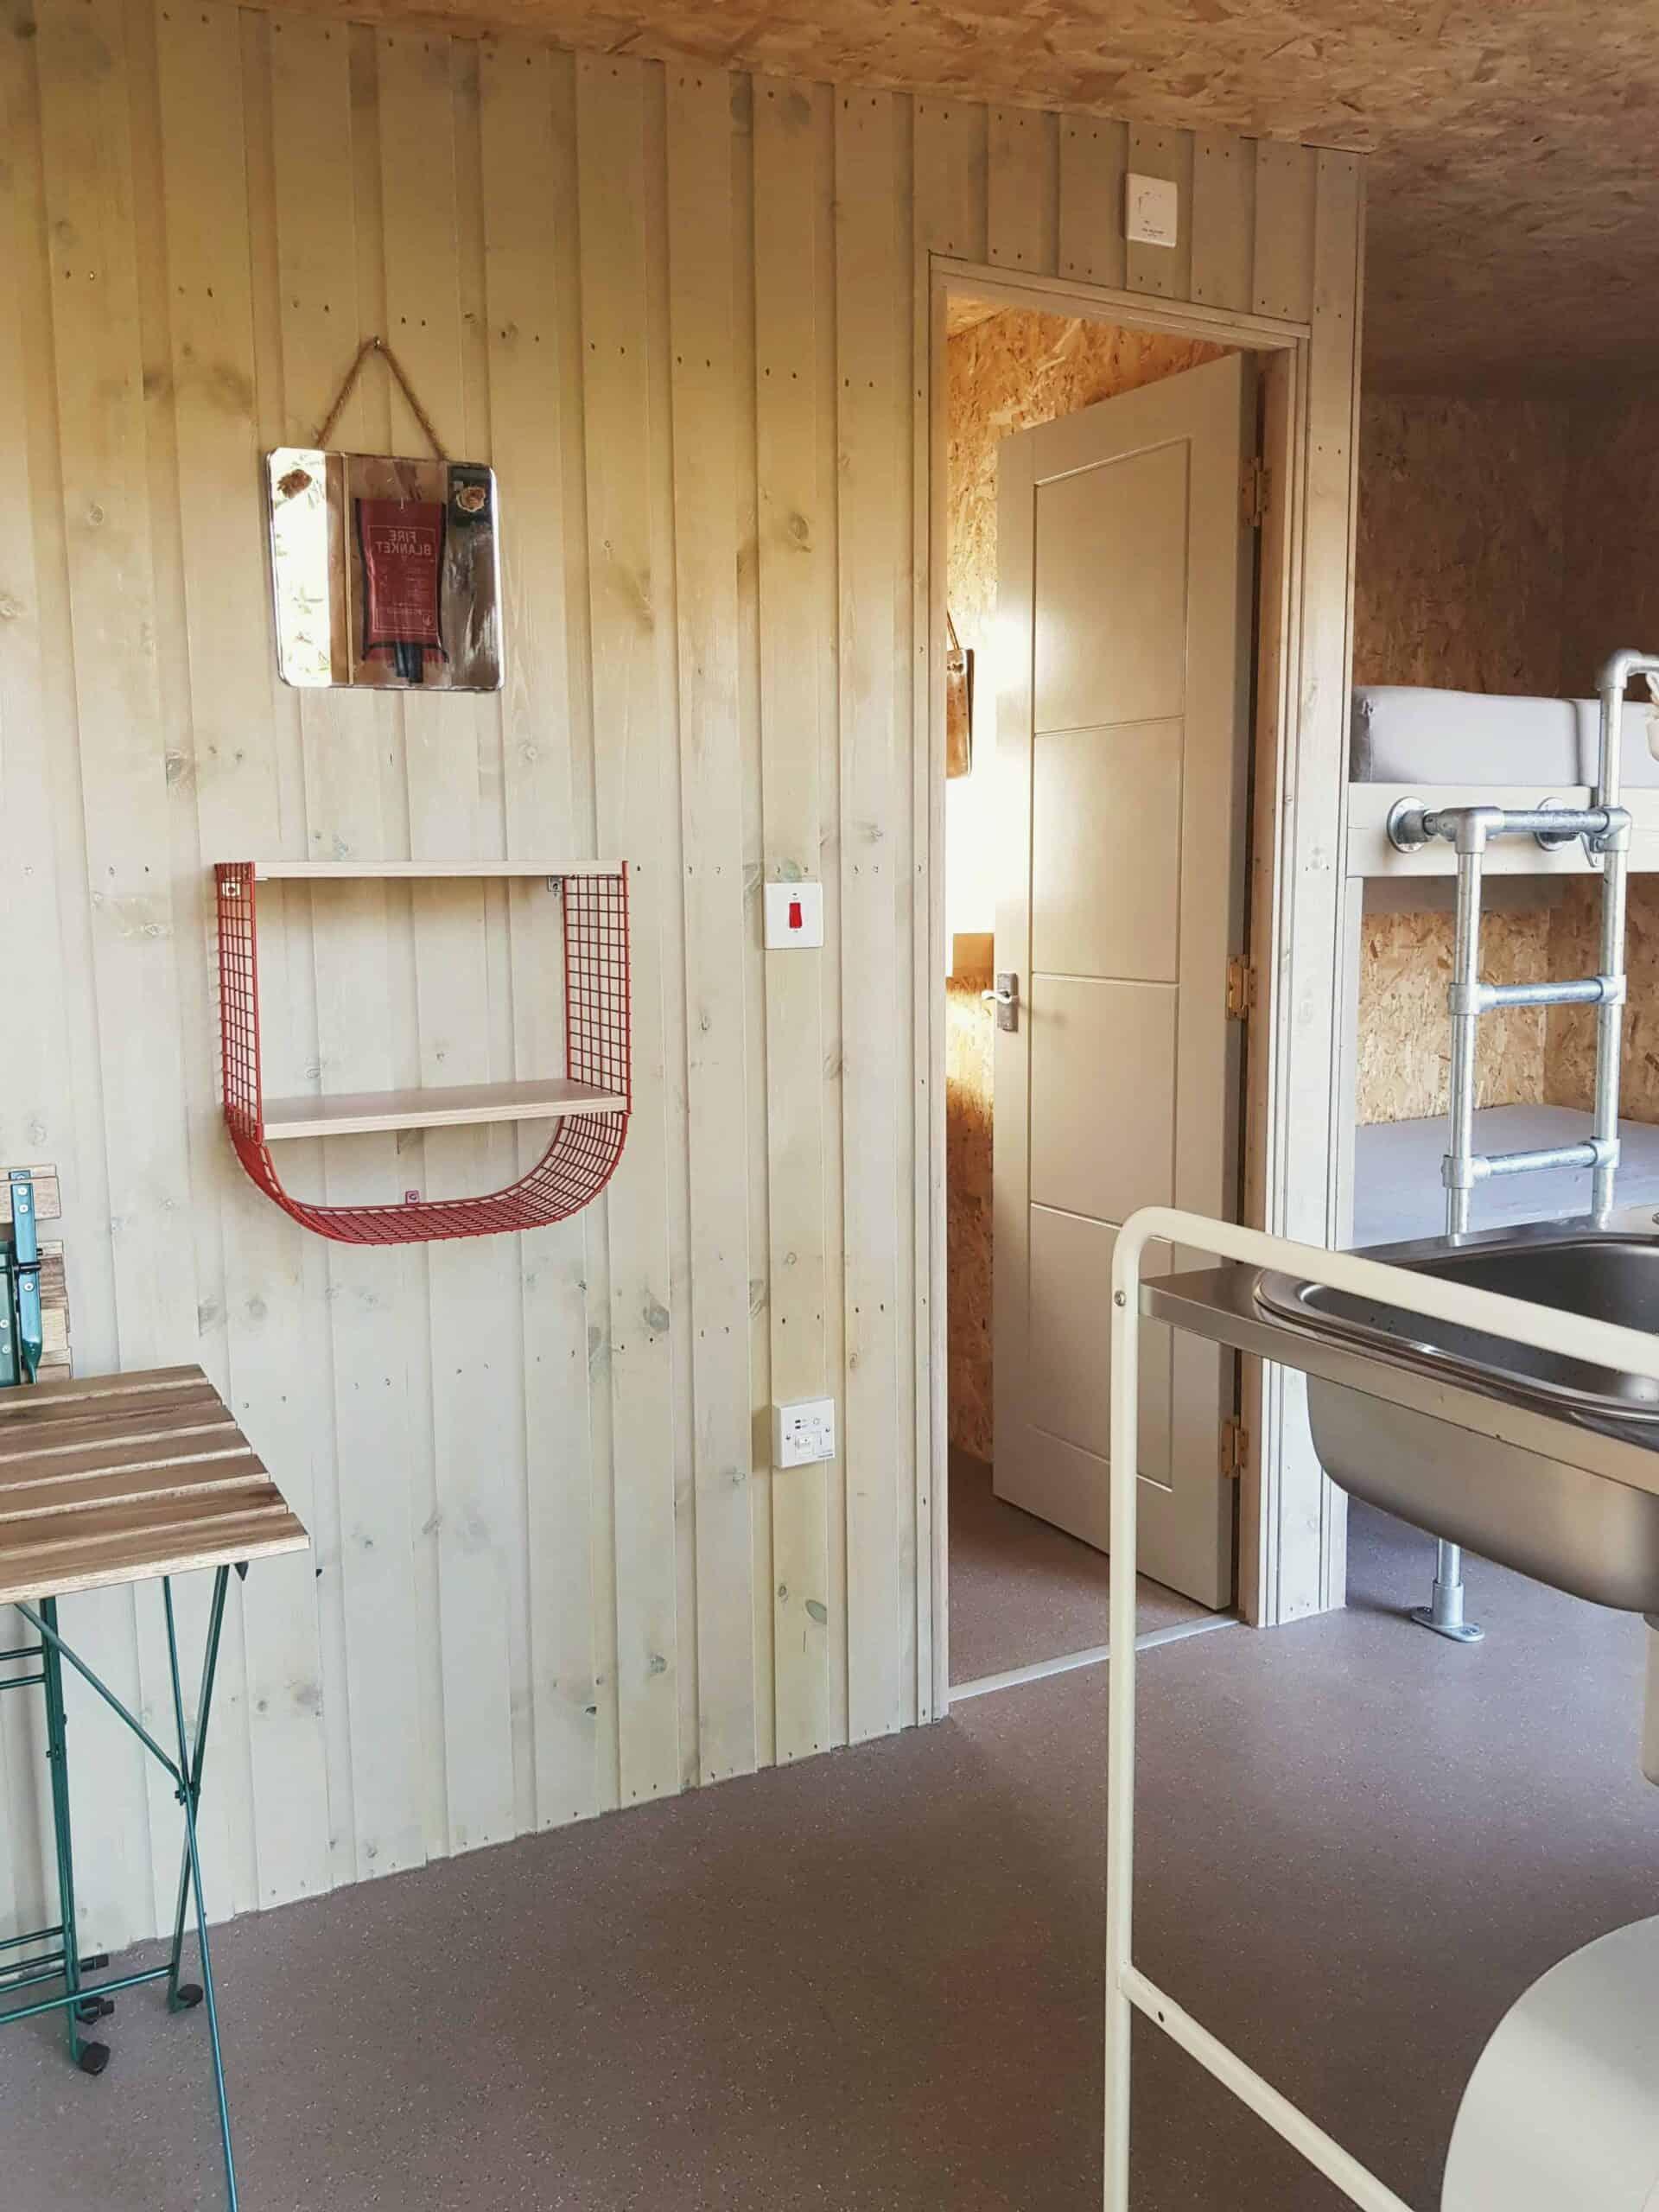 cabin fittings mirrow shelf table beds door to ensuite